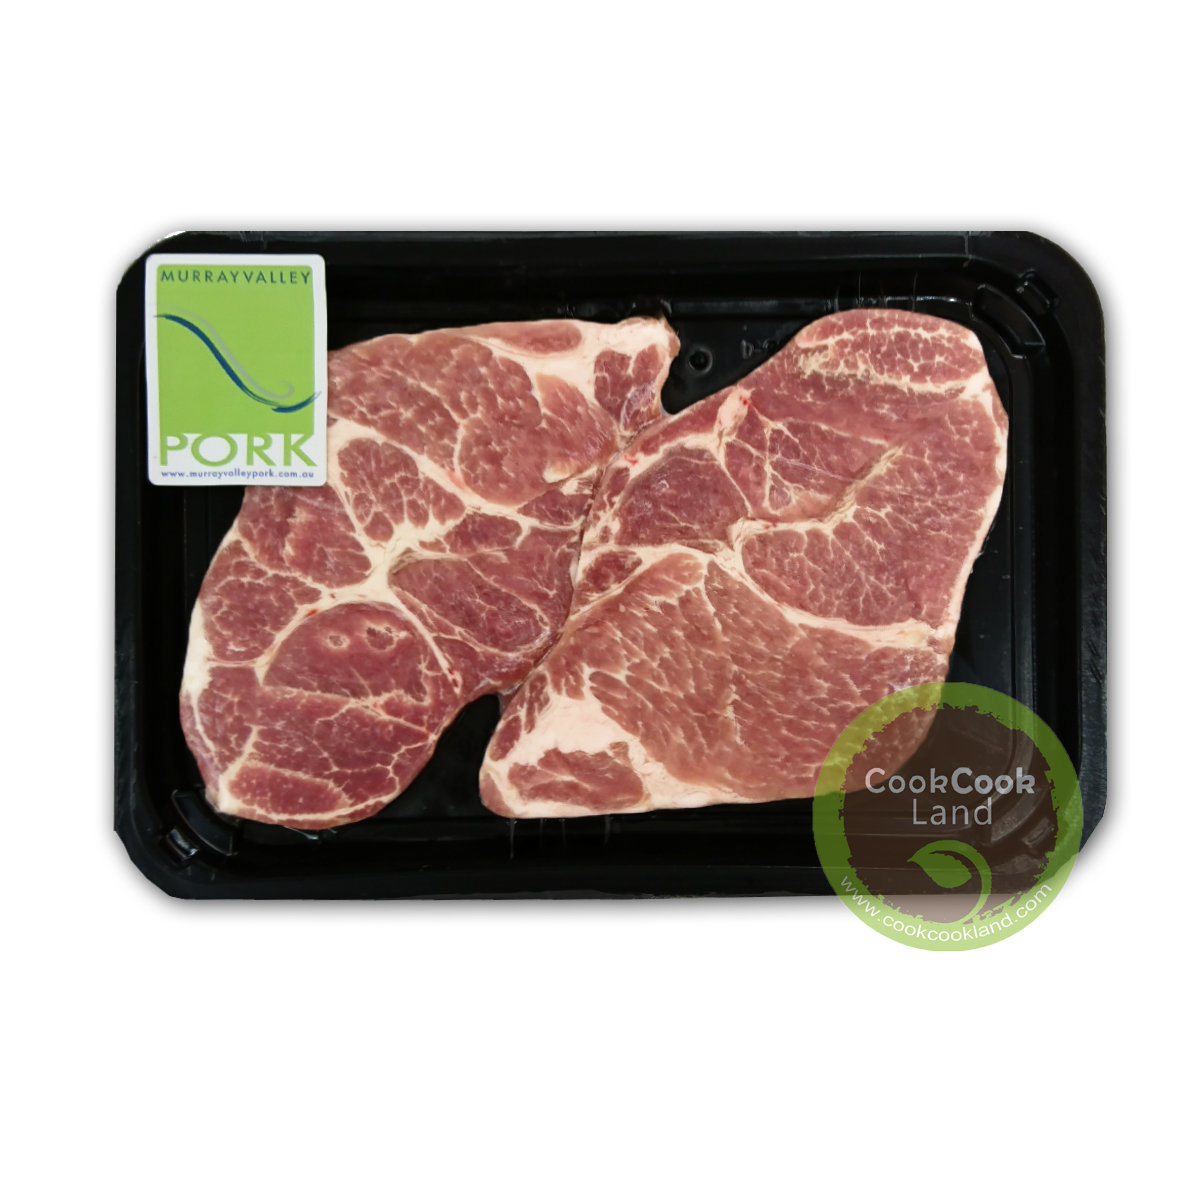 Australia Murray Valley No Added Hormones Boneless Pork Collar Butt 300g